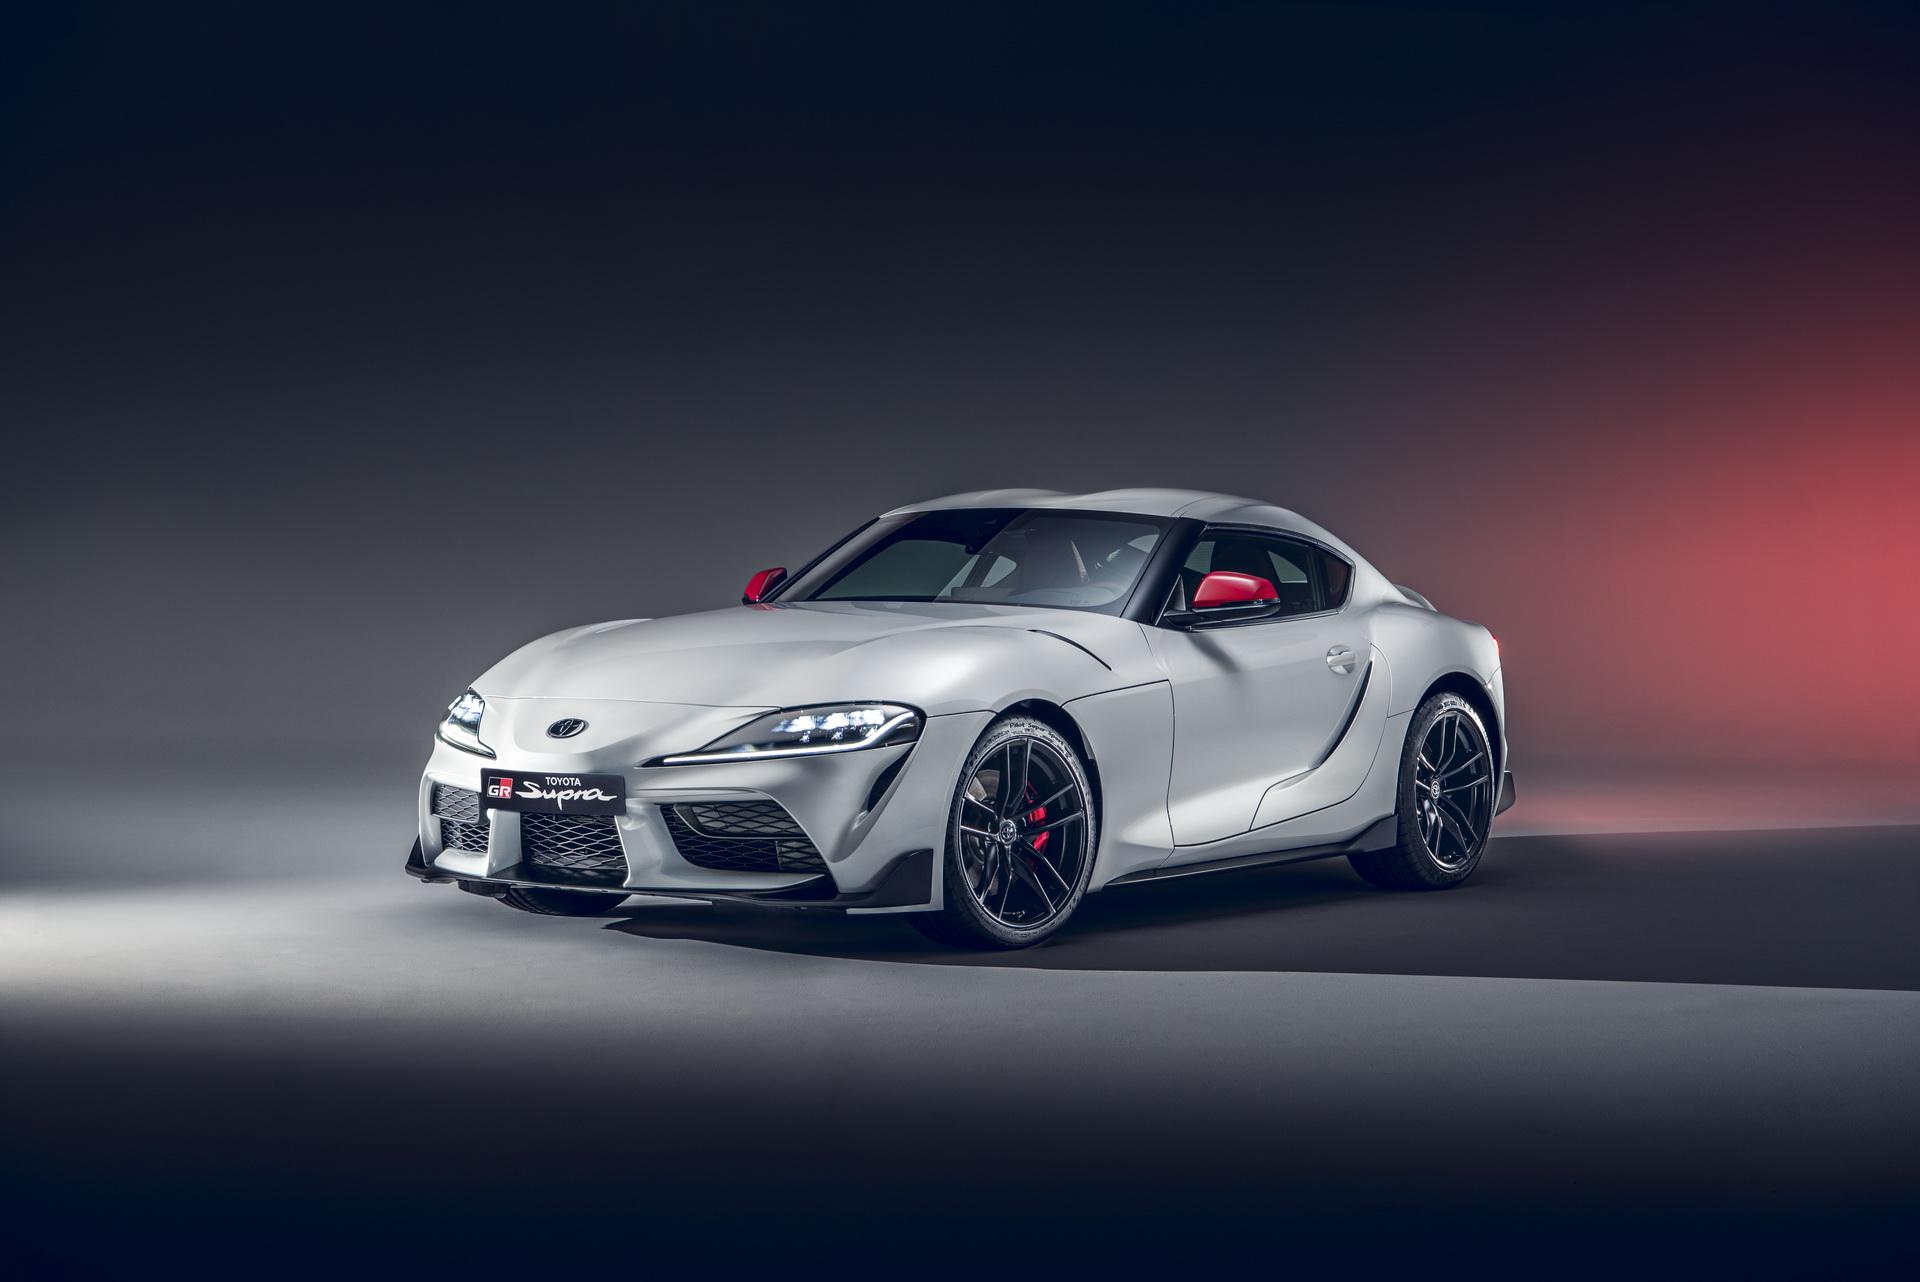 2020-Toyota-GR-Supra-2LT-01